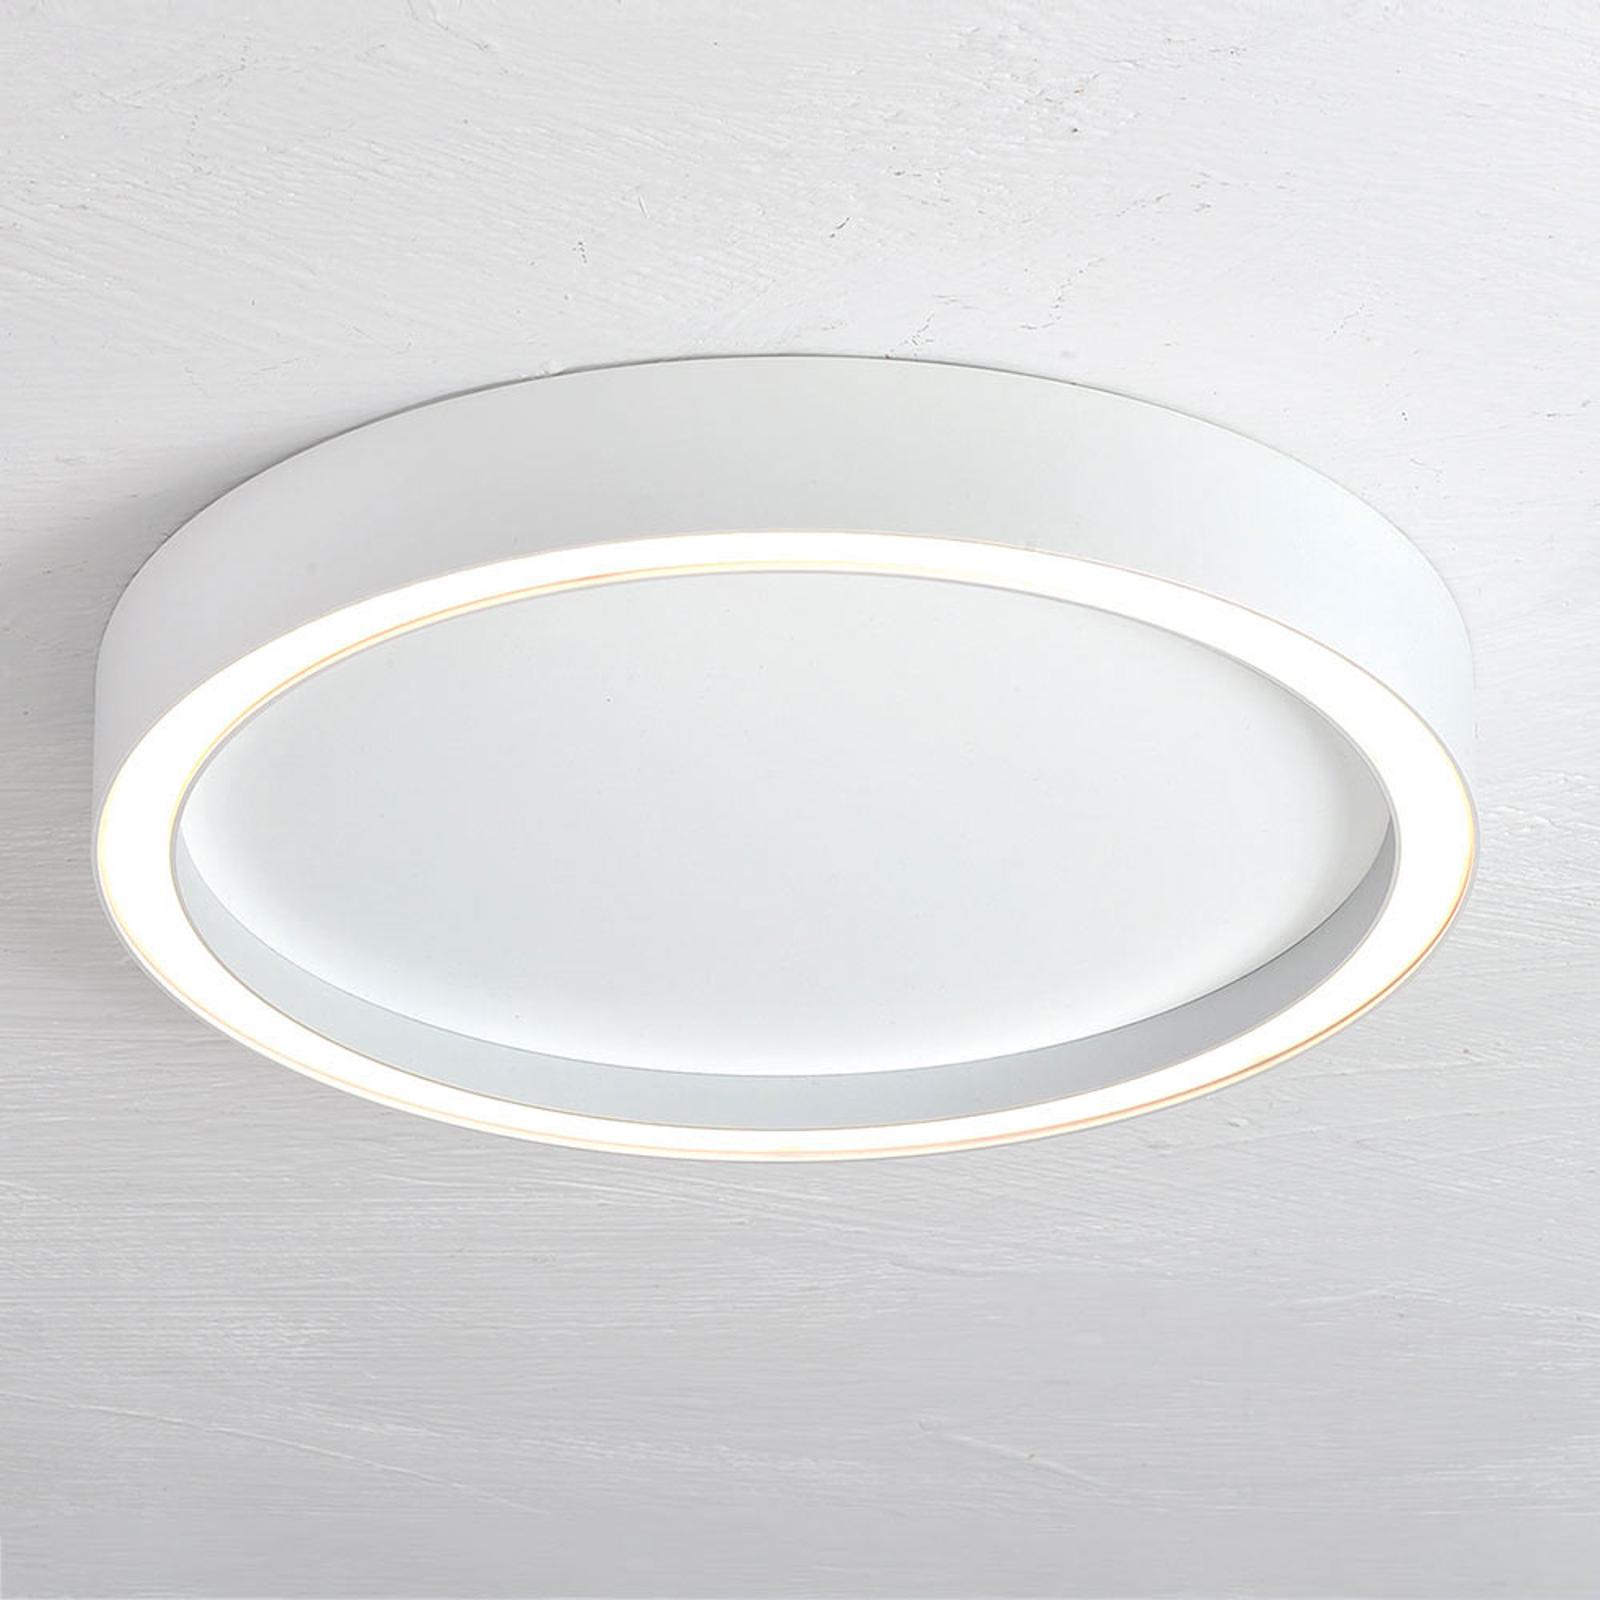 Bopp Aura LED plafondlamp Ø 30cm wit/wit